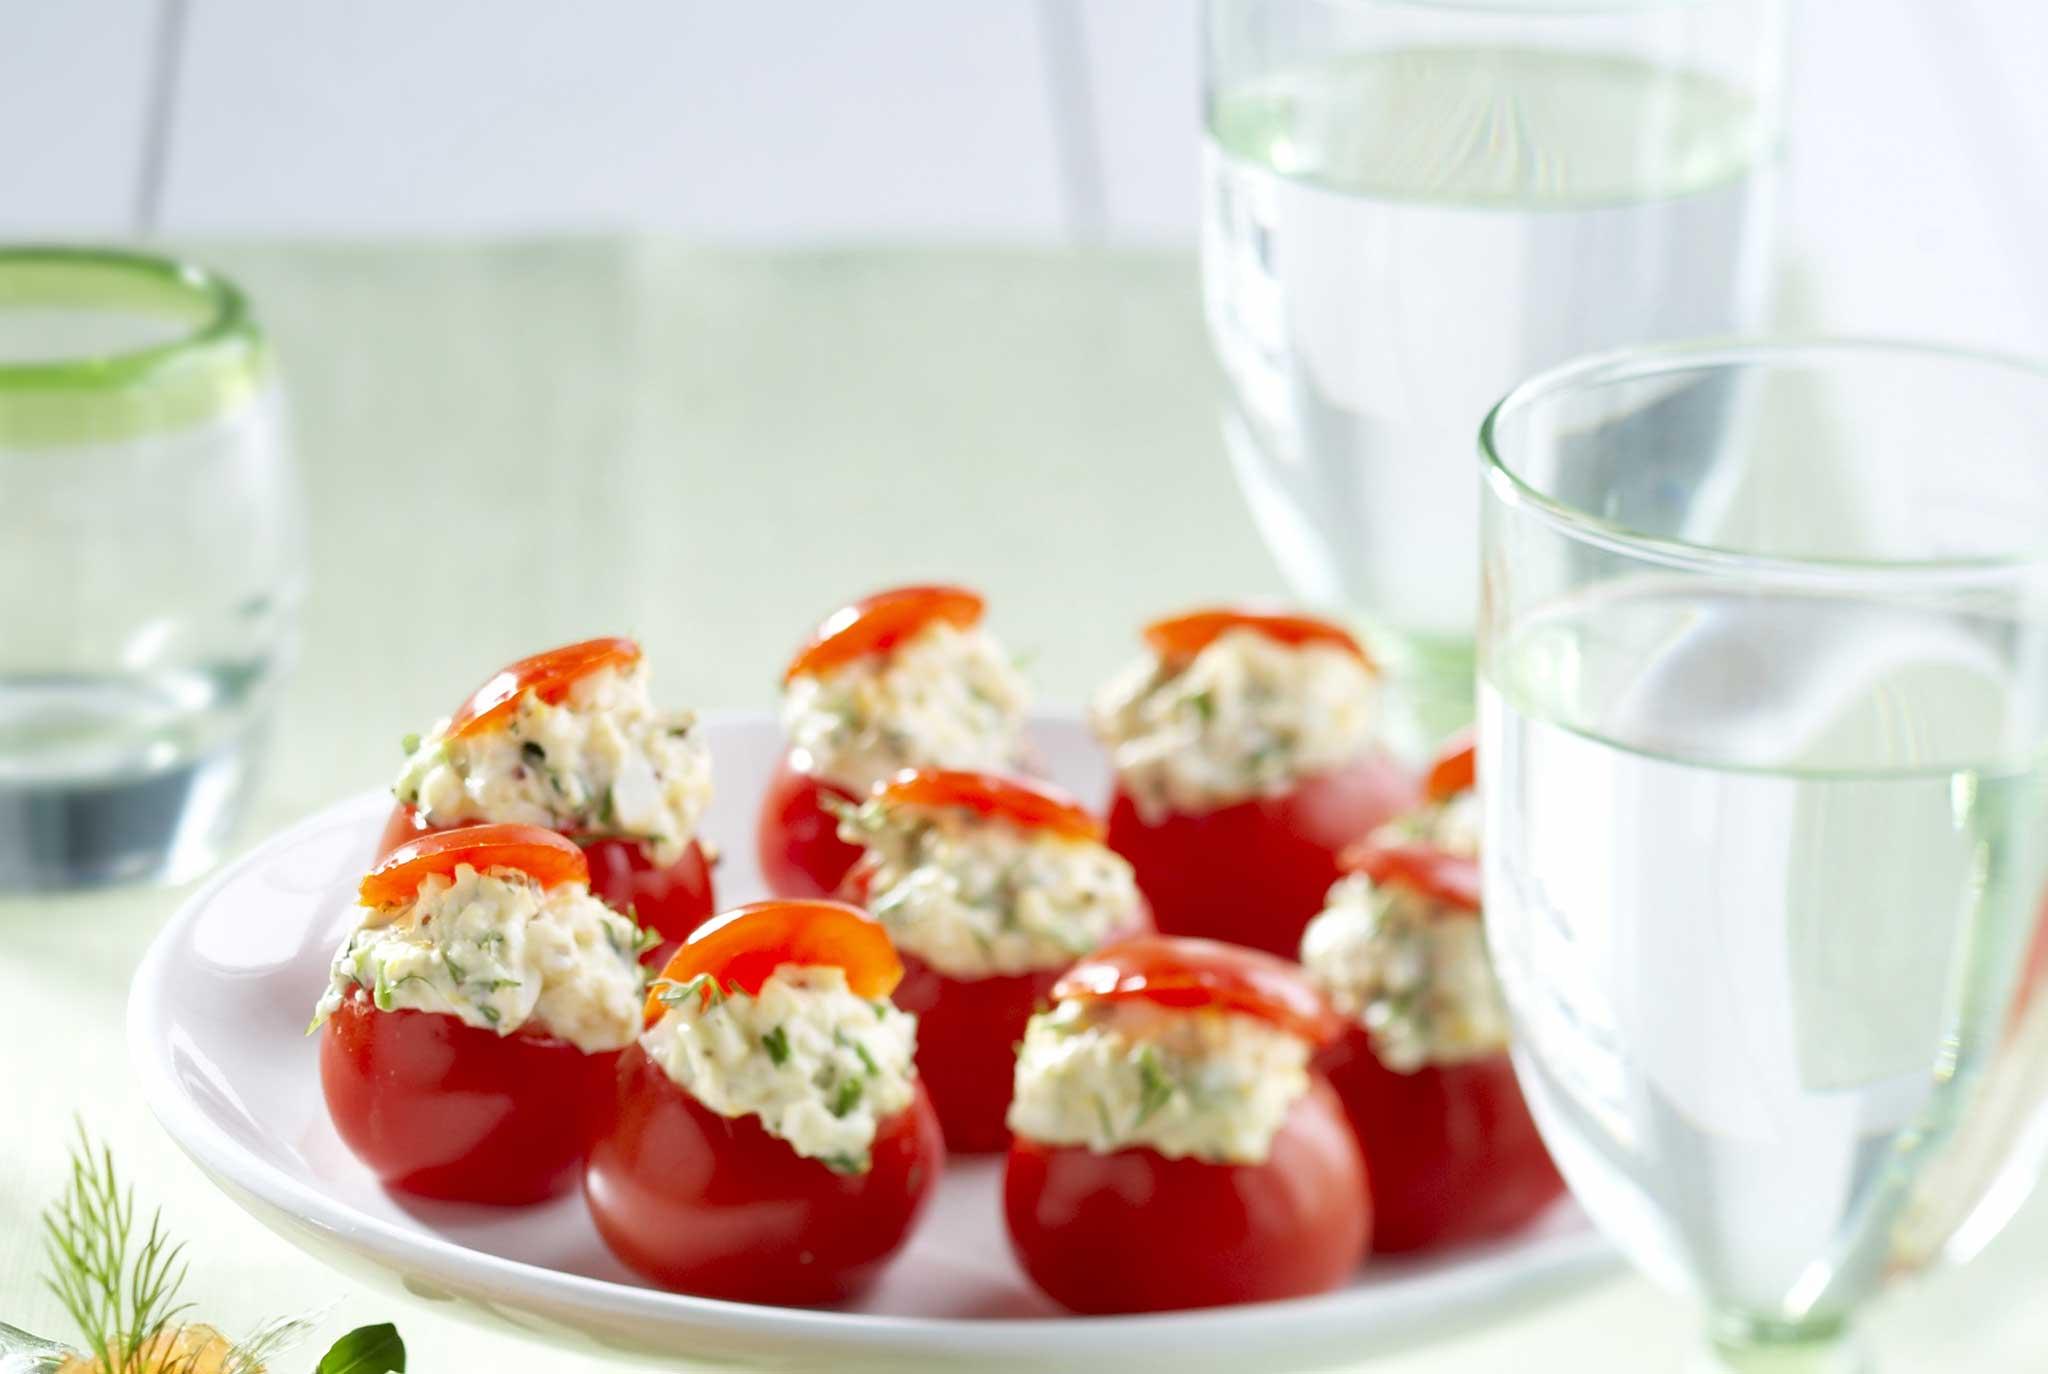 958891-taytetyt-tomaatit.jpg